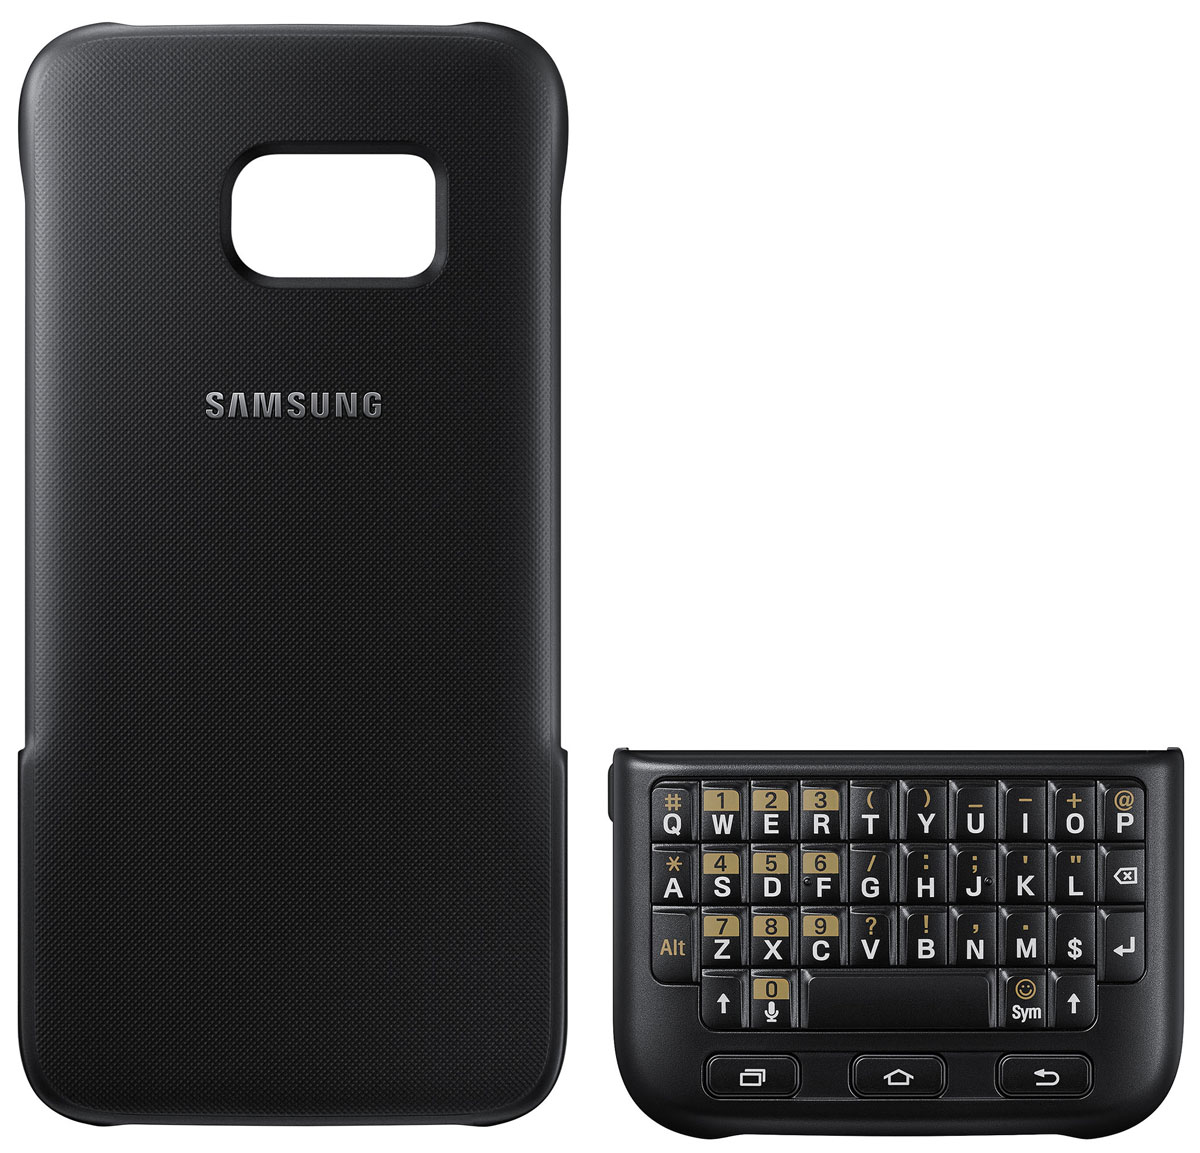 все цены на Samsung EJ-CG930 Keyboard Cover чехол-клавиатура для Galaxy S7, Black онлайн